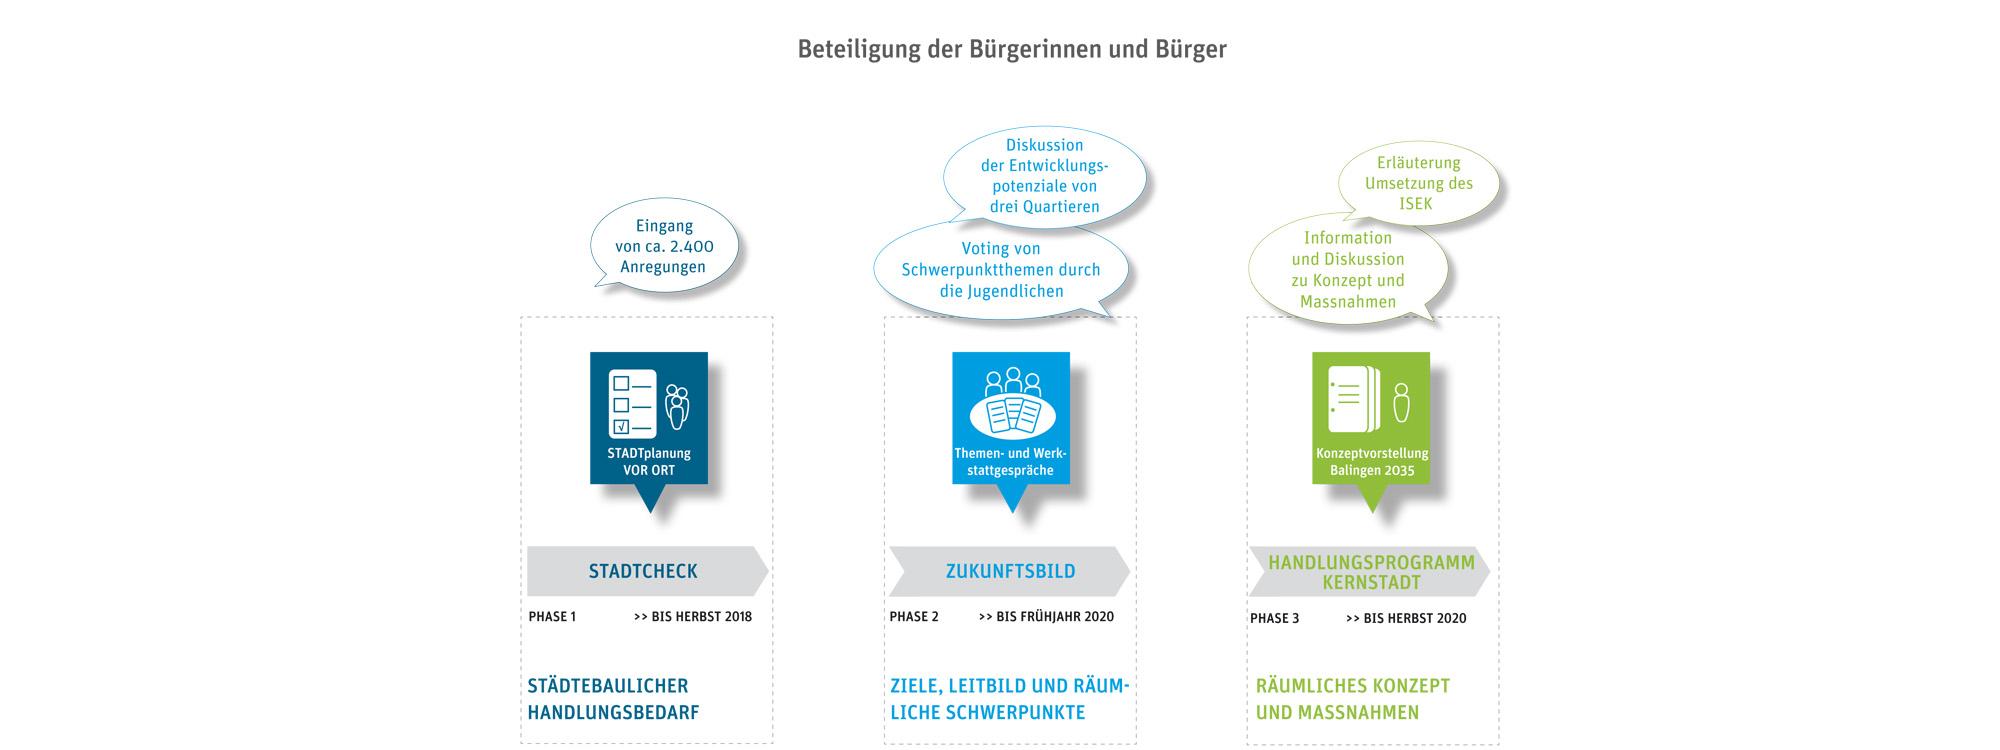 Balingen_ISEK_Dialog_Beteiligung_Stadtentwicklung_Leitbild_PeschParter_Entwicklungsstrategien_Zukunftsbild